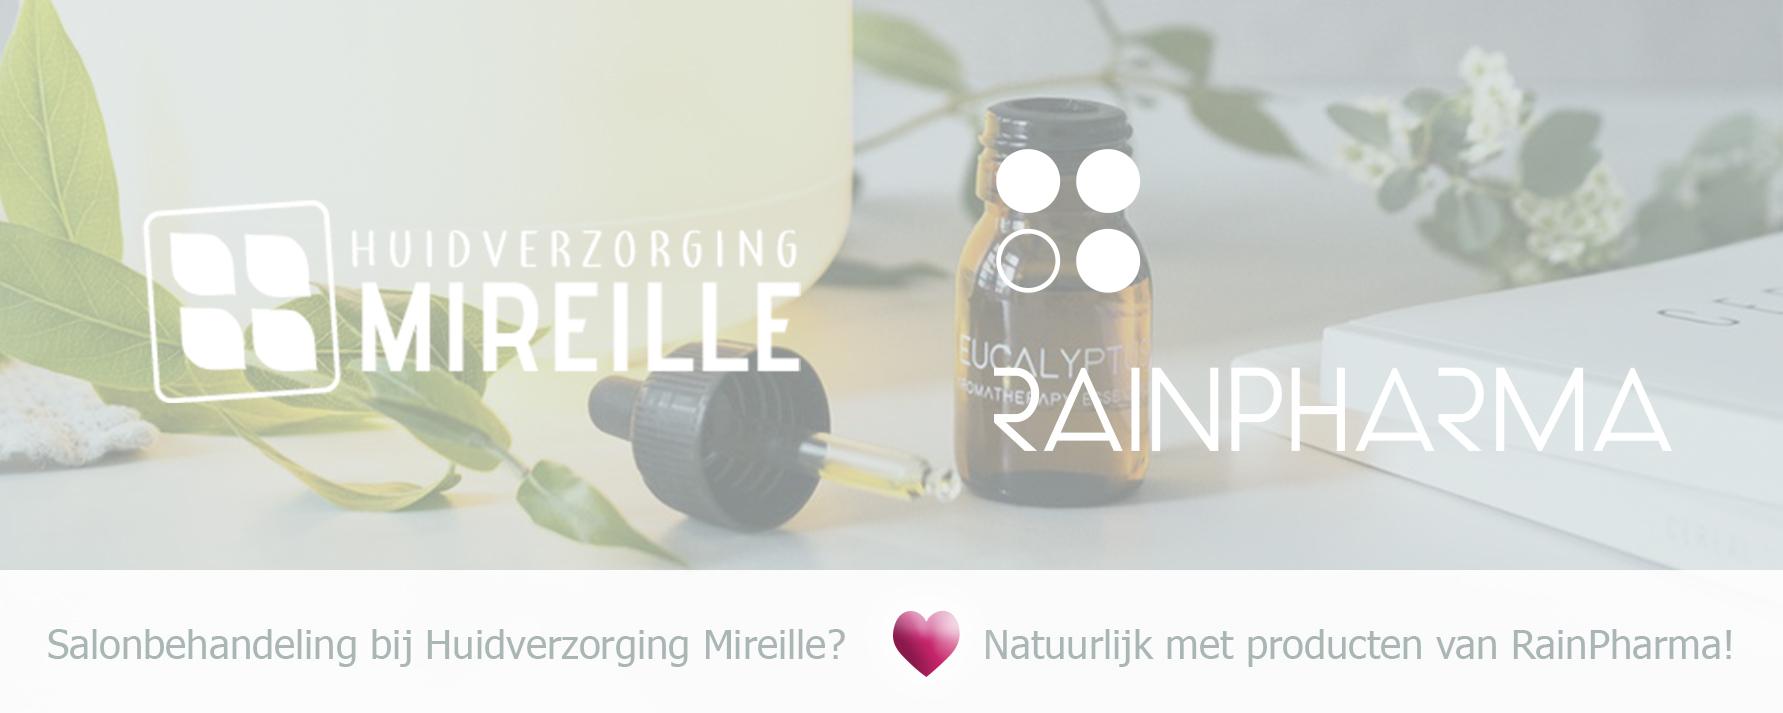 Huidverzorging Mireille loves RainPharma